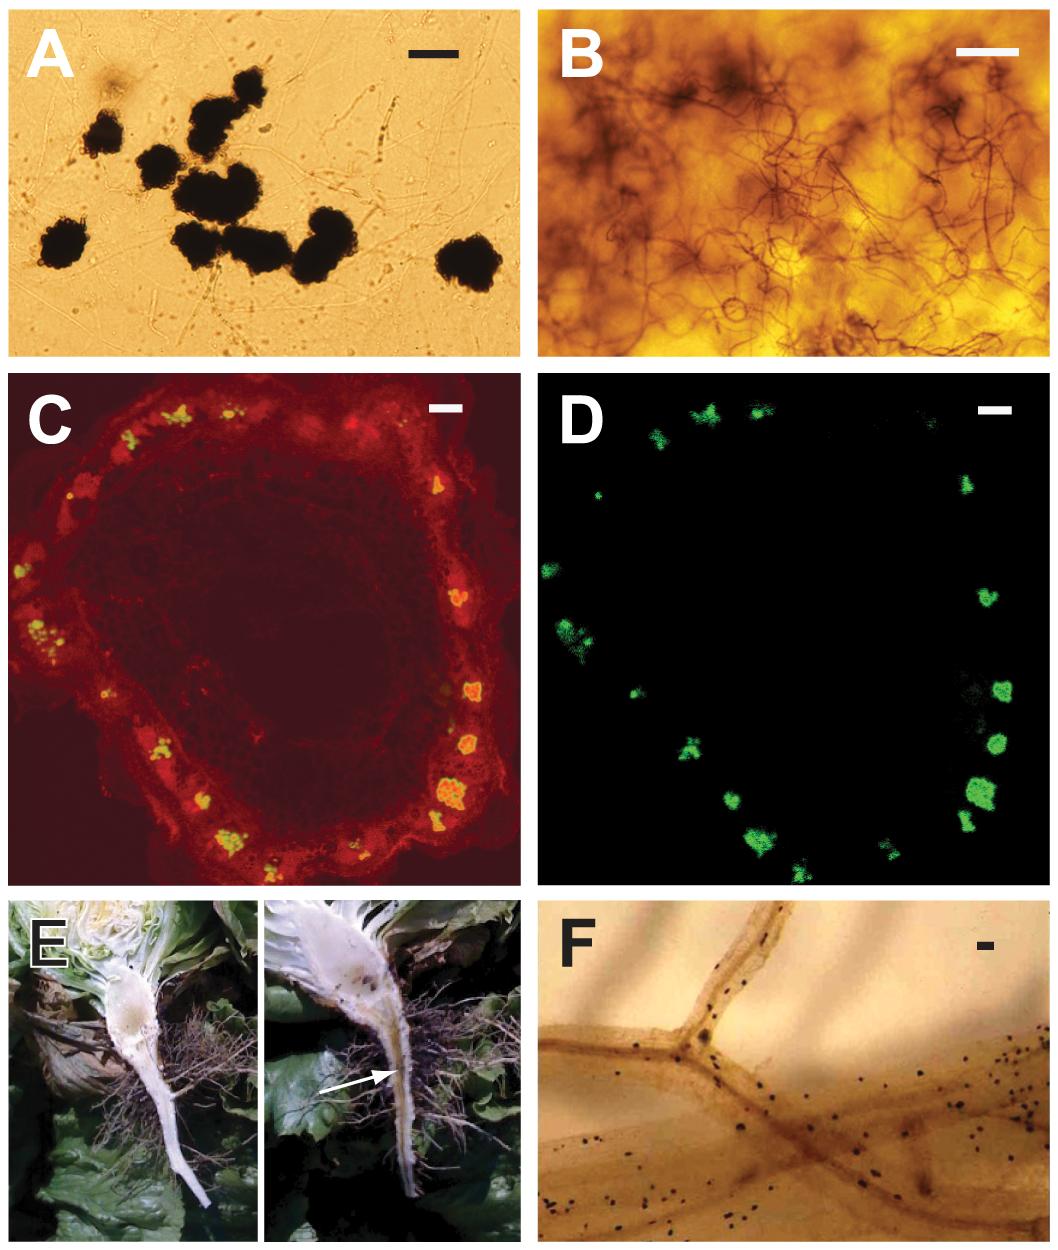 Characteristics of <i>Verticillium dahliae</i> (<i>Vd</i>) and <i>V. albo-atrum</i> (<i>Vaa</i>) used in the comparative genomics analyses, showing hallmark morphological features of the fungi, and aspects of plant colonization.